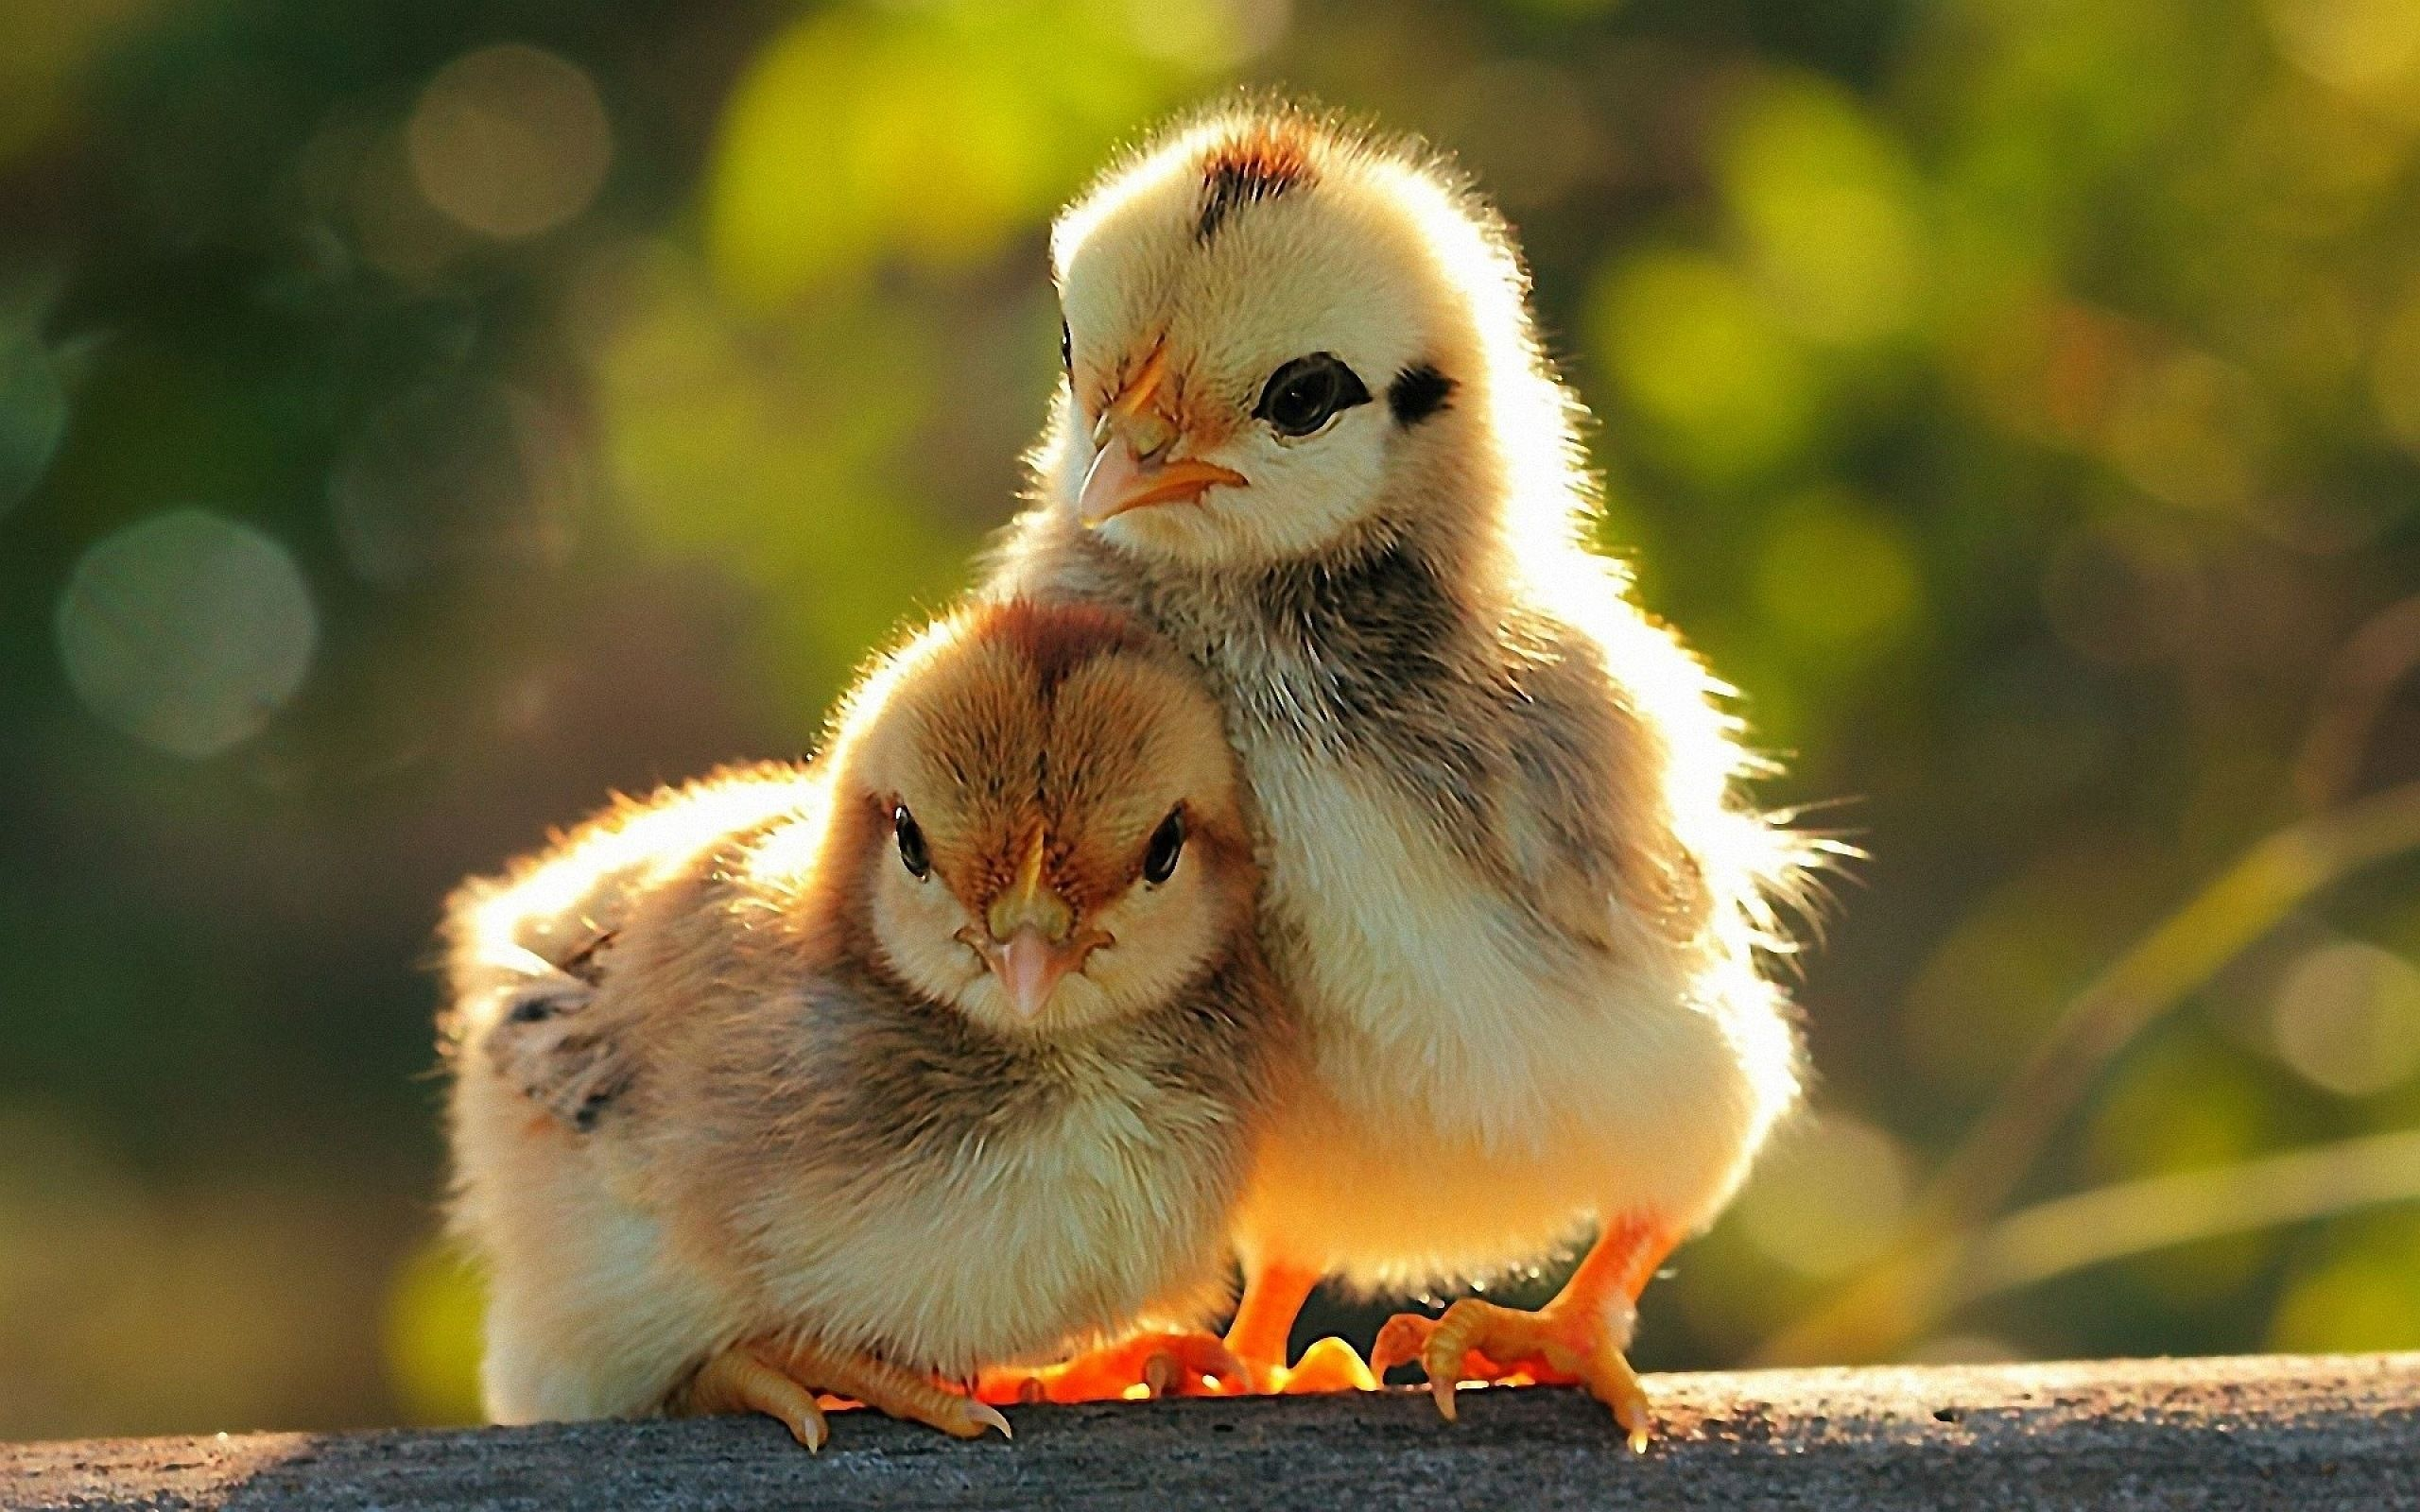 Cute Animals Animals Animals beautiful Pet birds 2560x1600